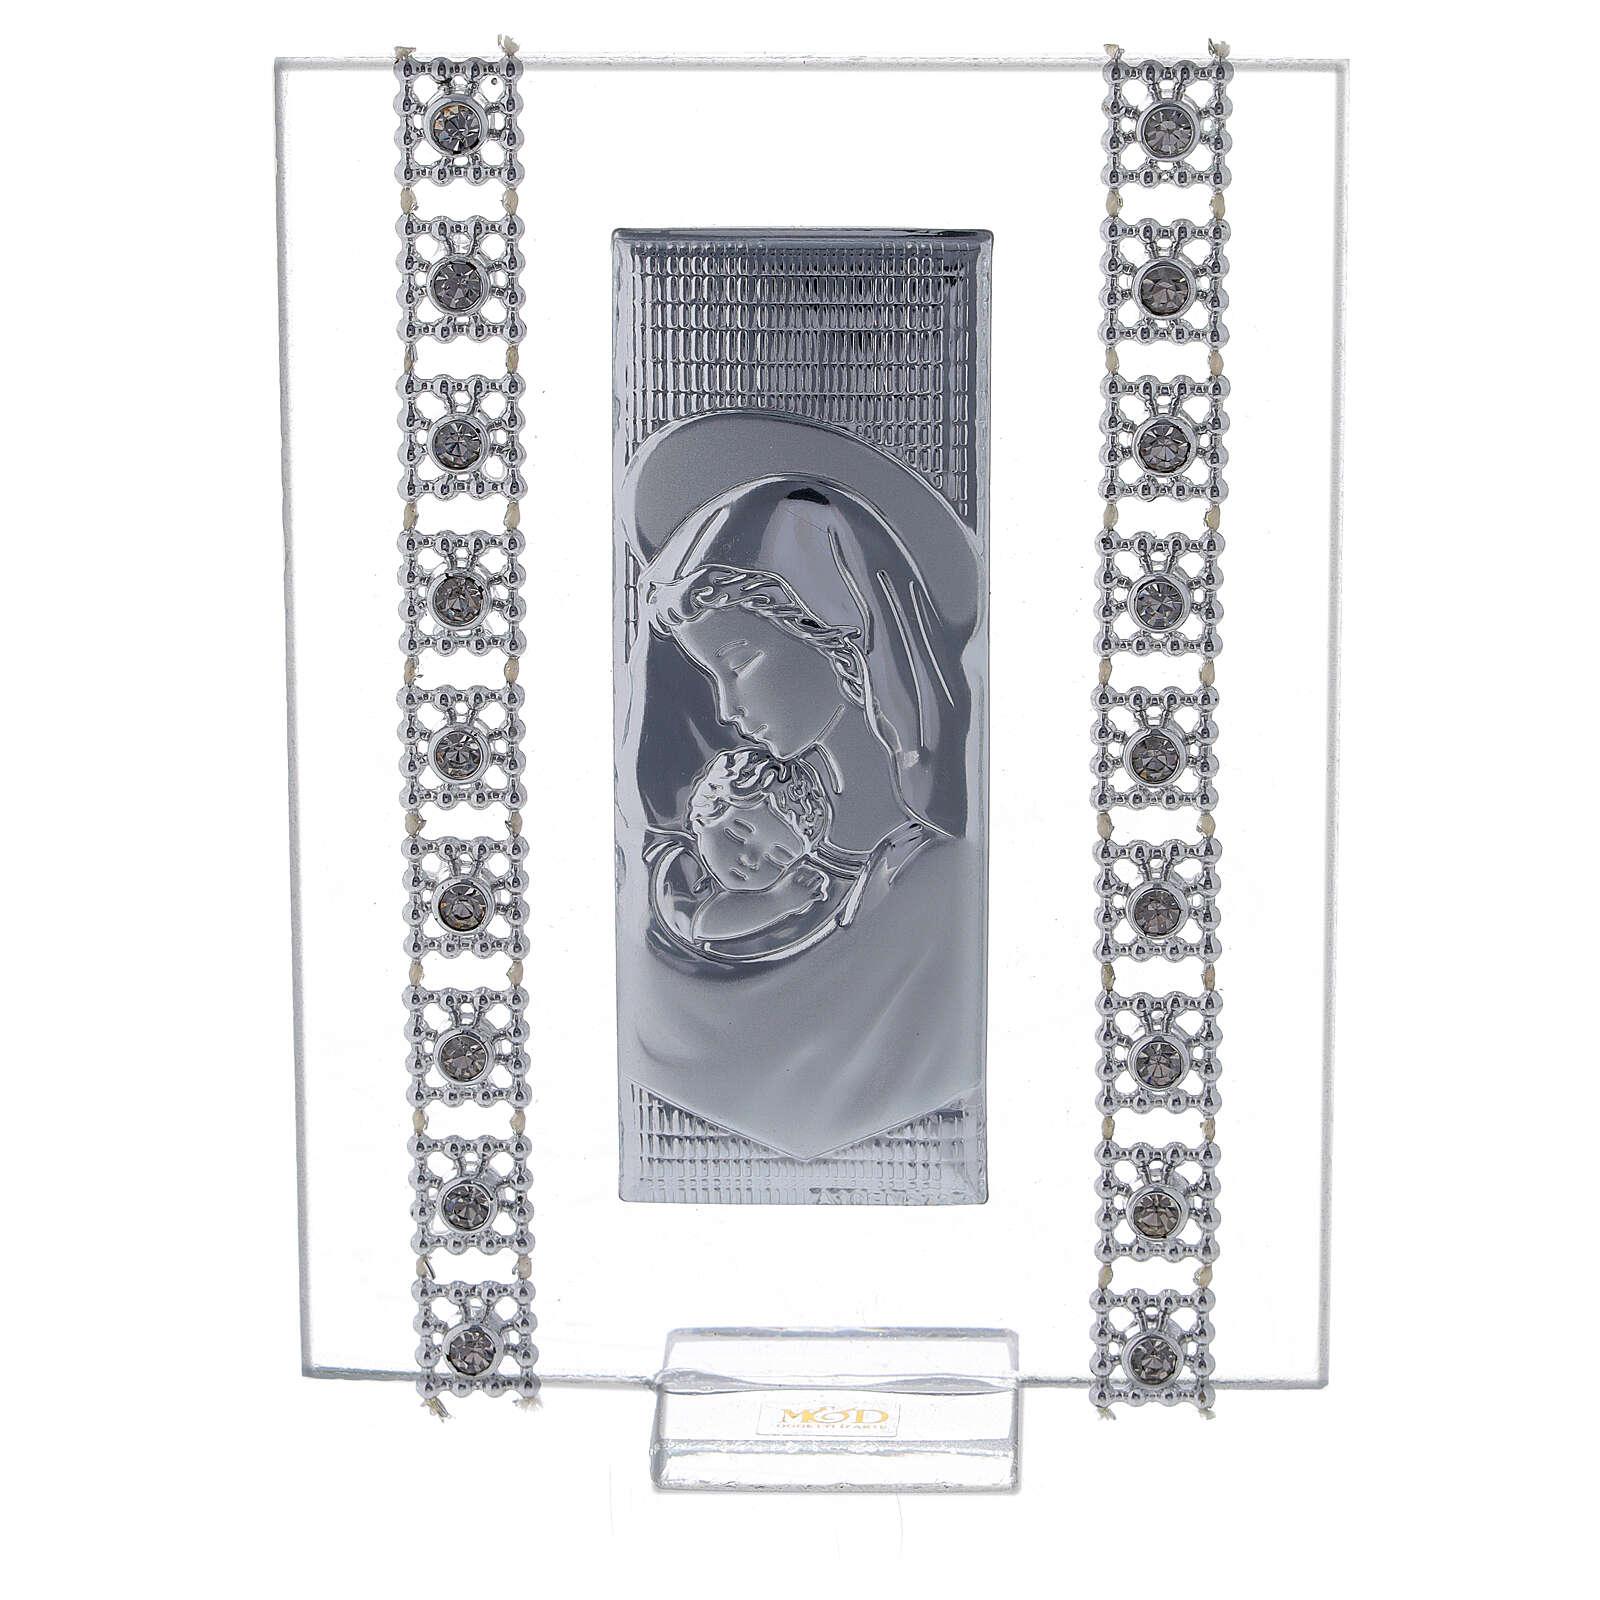 Souvenir cadre maternité avec strass 3